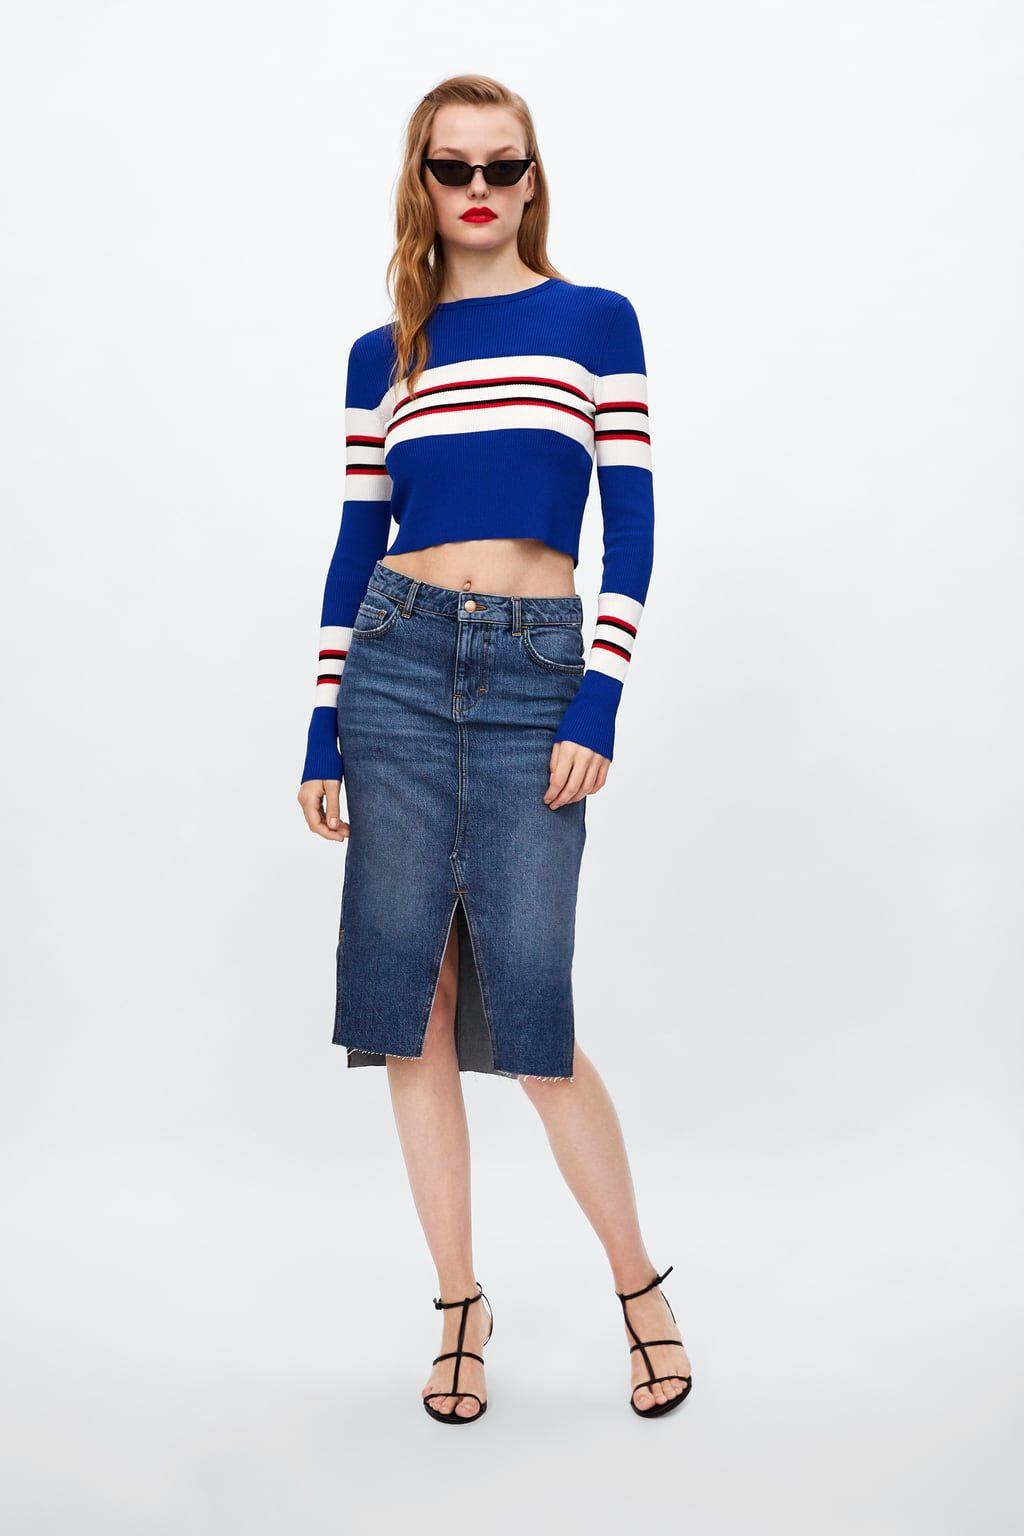 d37d845f173f8 Jean En 2018 Image Jupe Zara Tube Mode 1 De Z1975 qIPITX